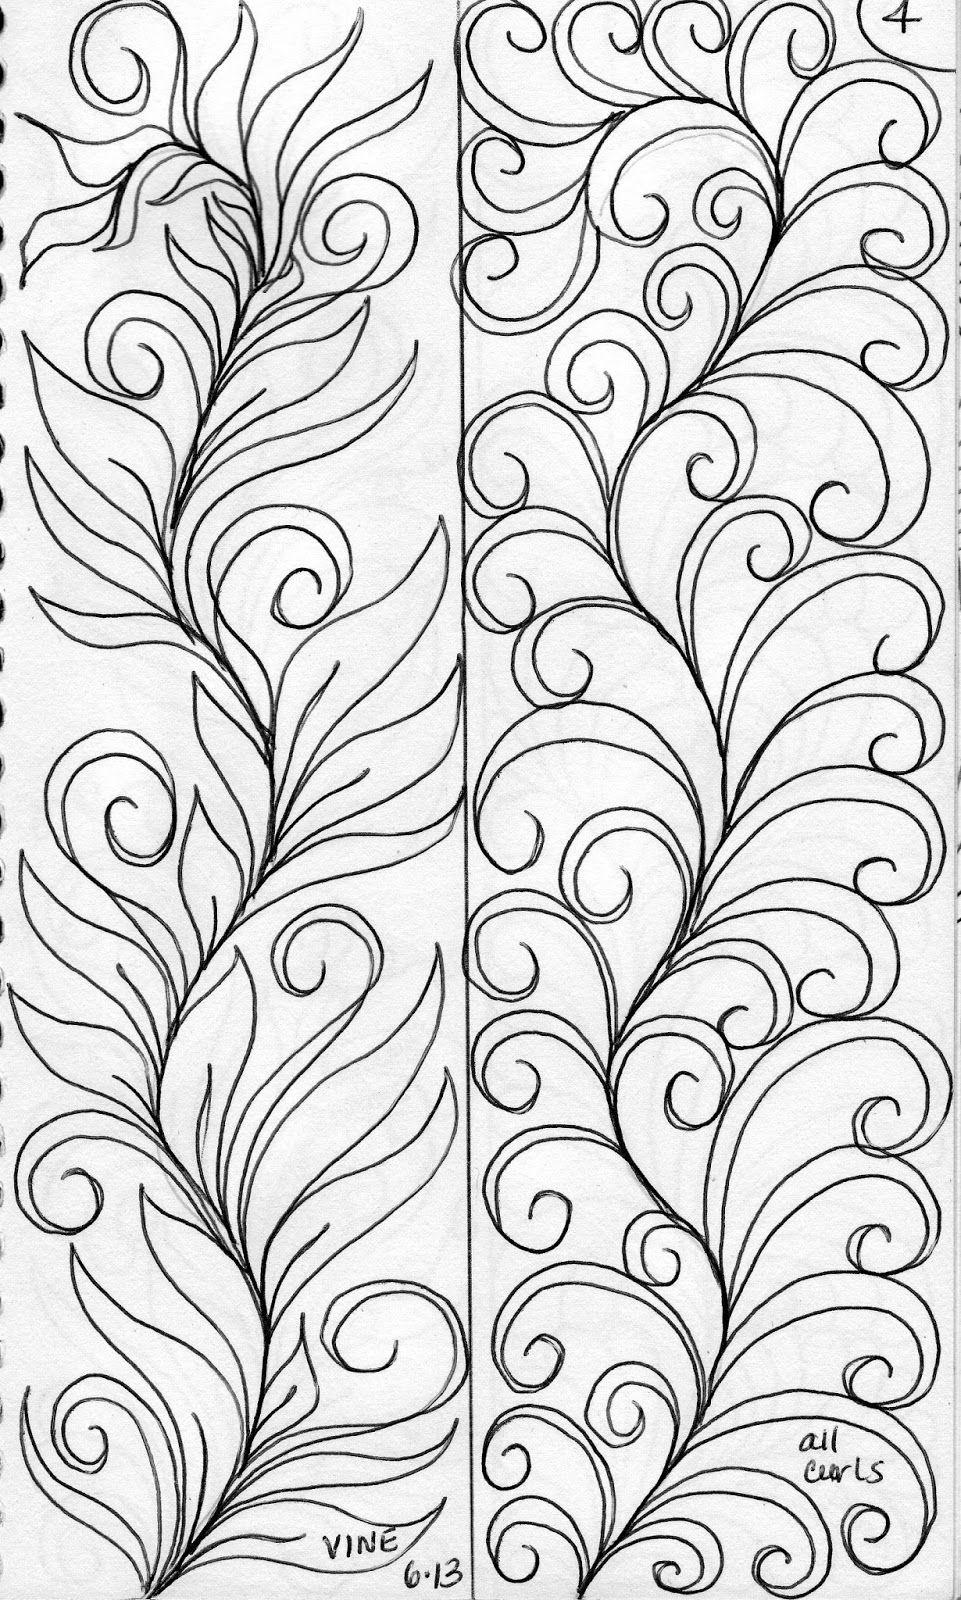 Pin de Mlrmarge en Decorating tips   Pinterest